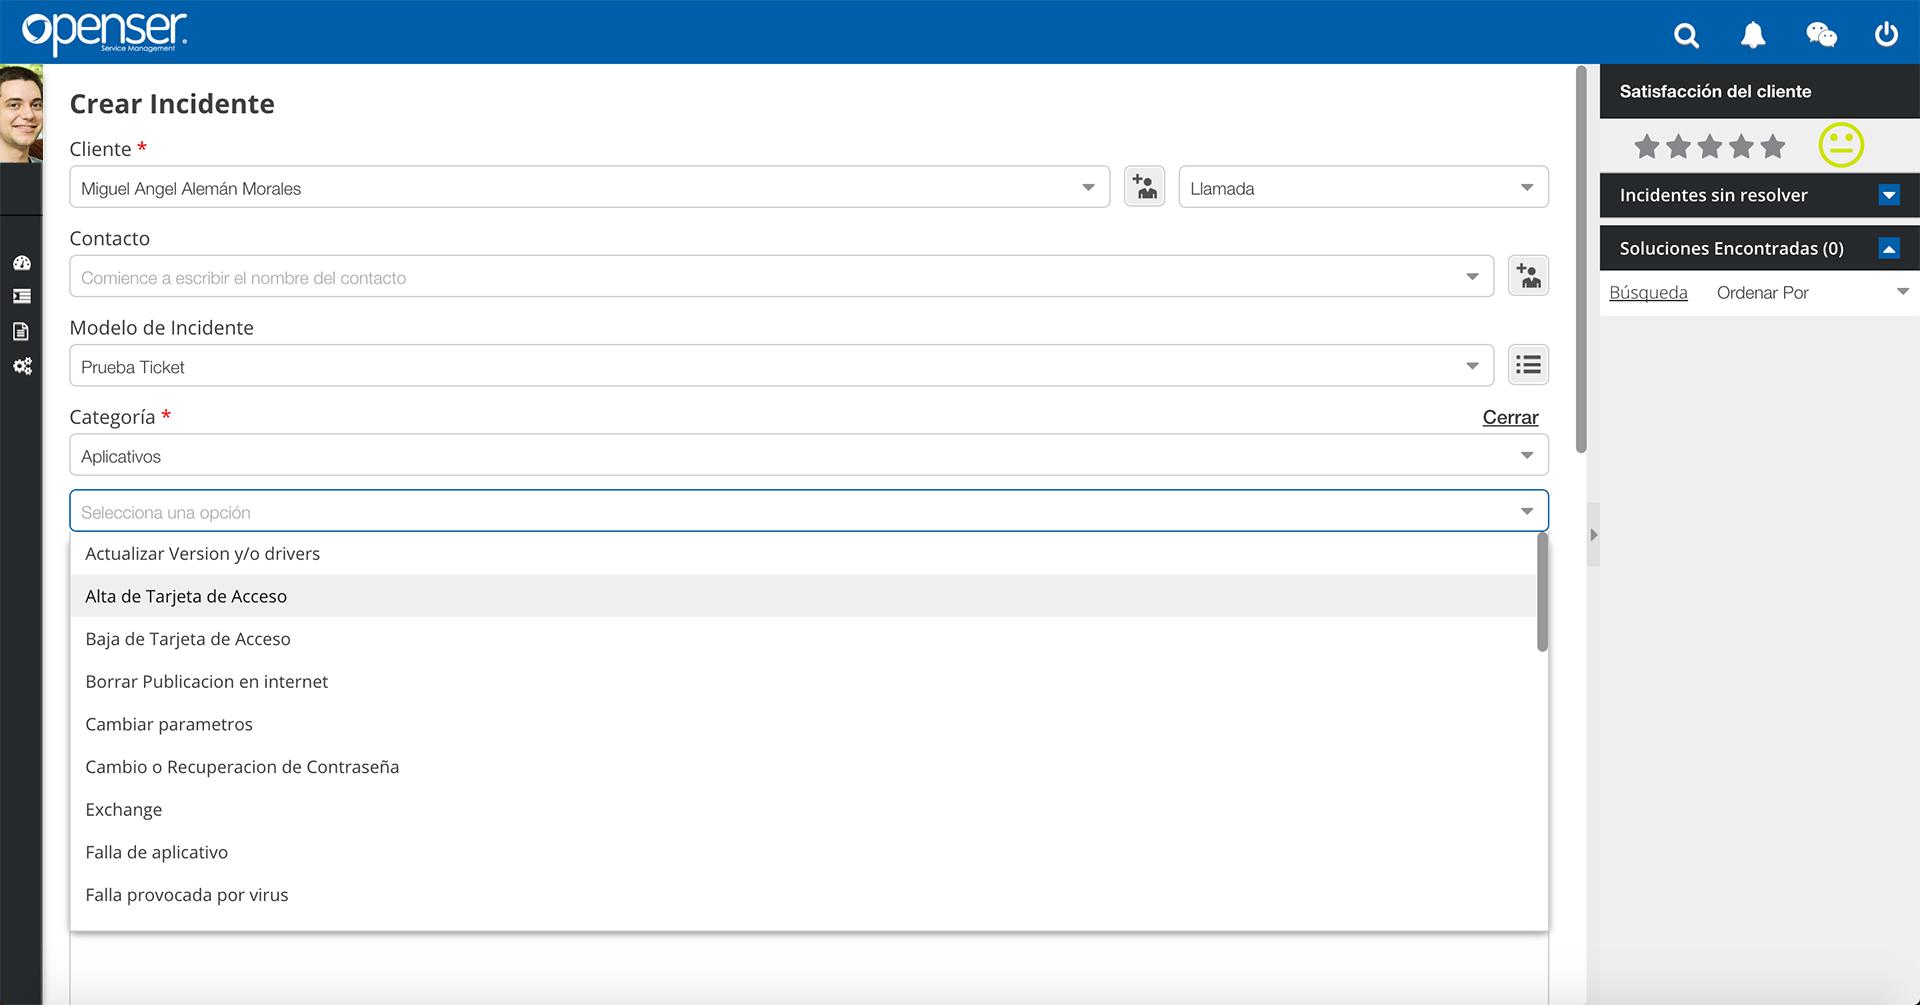 Registro de Incidentes - Openser